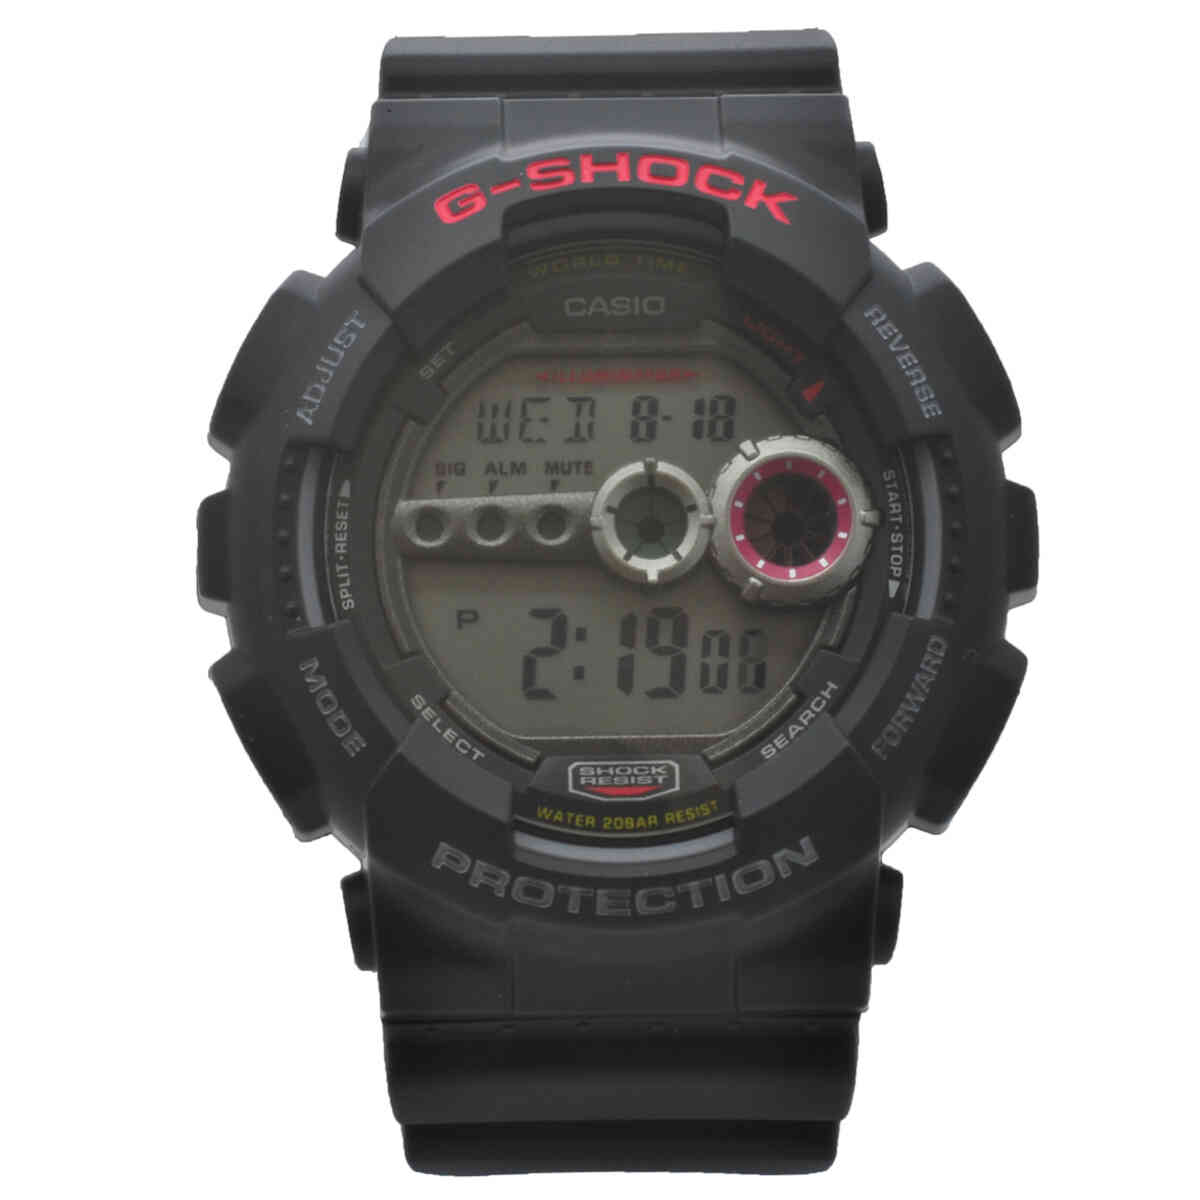 Relógio de Pulso Casio G-Shock Masculino GD-100